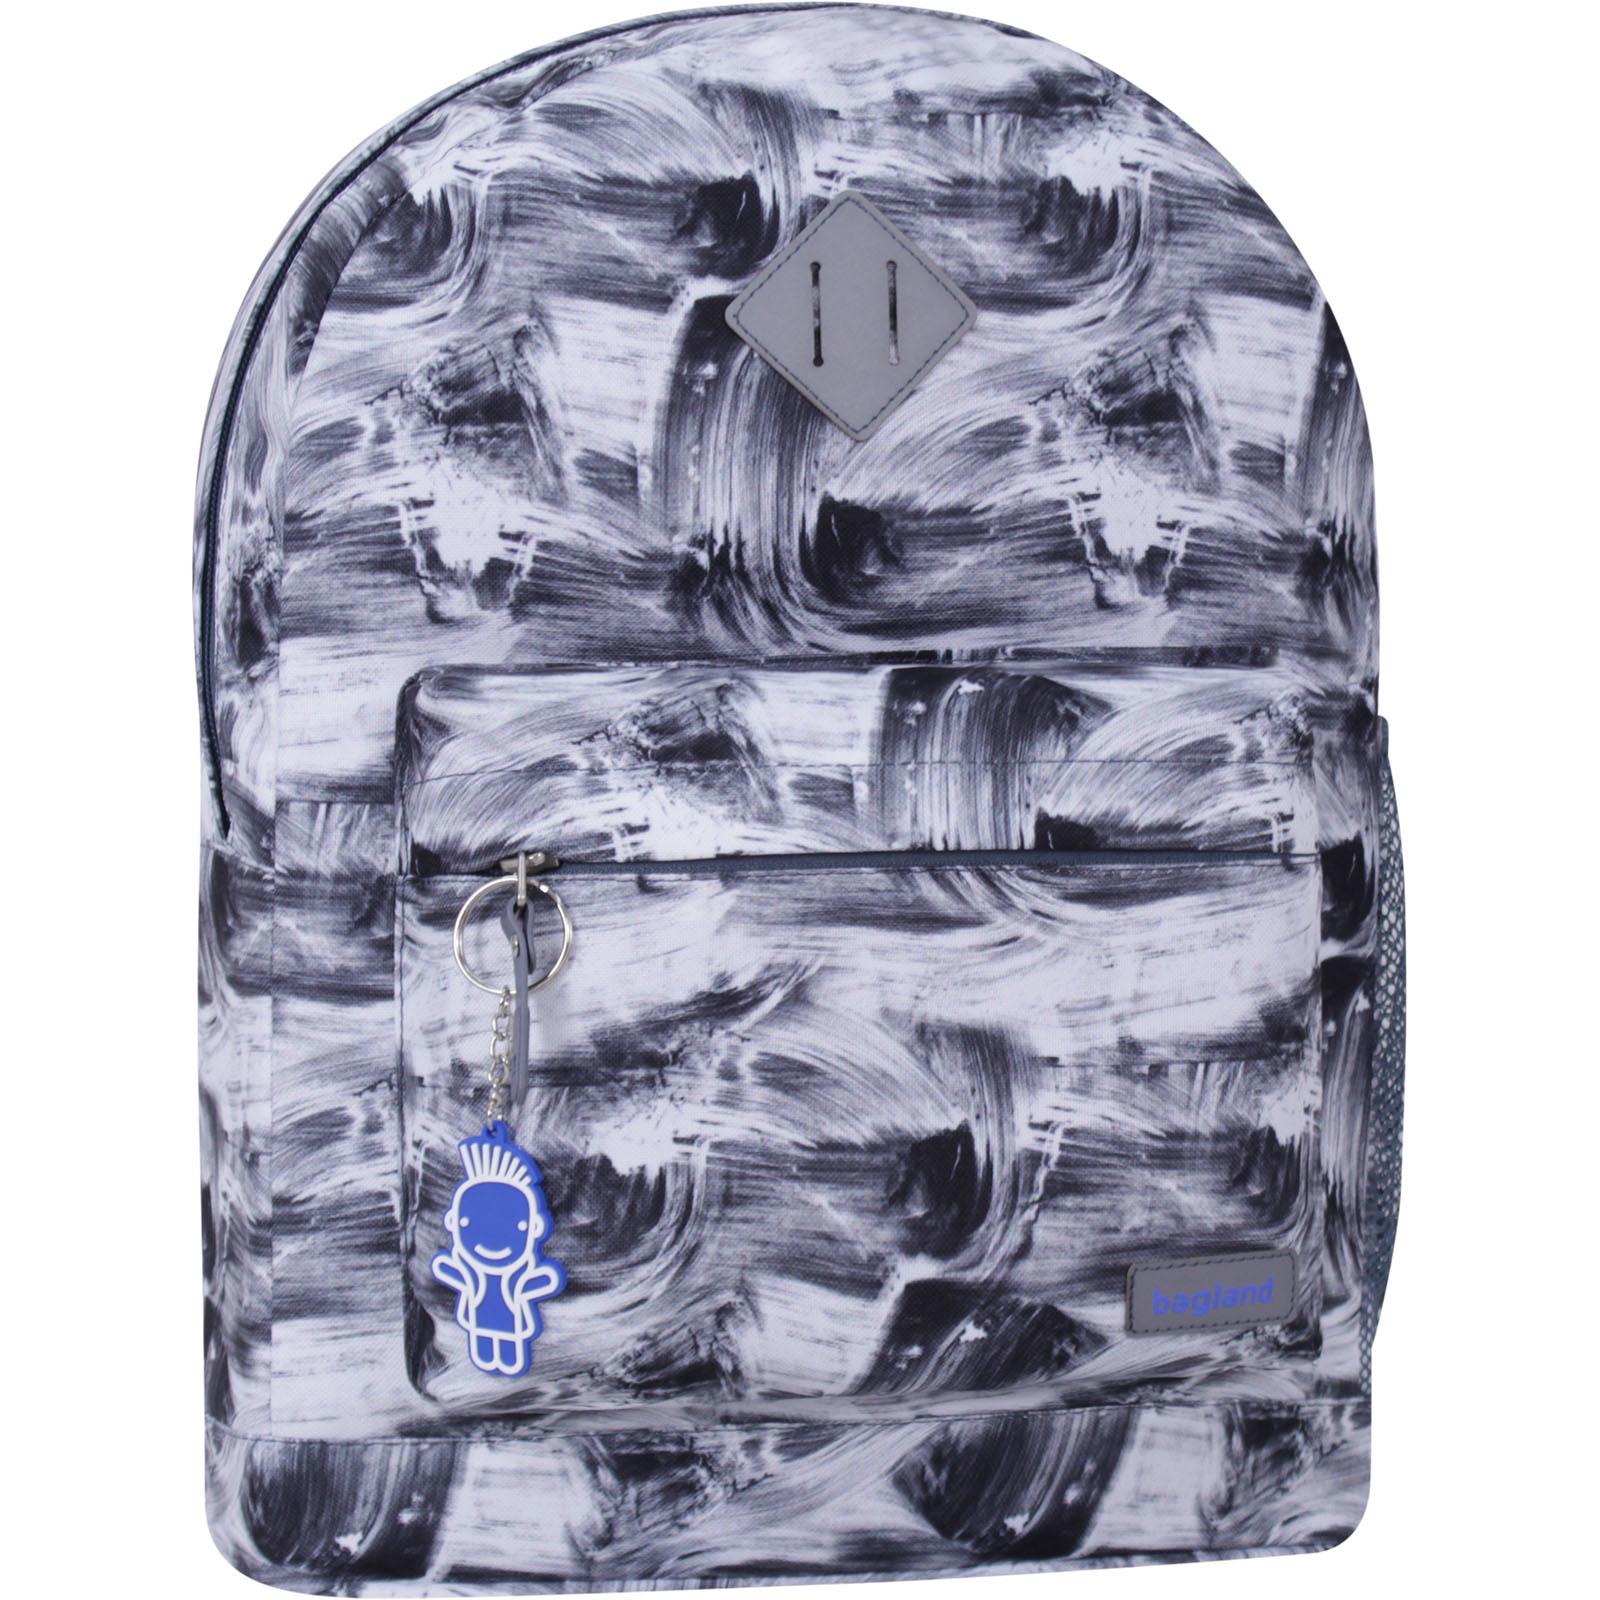 Городские рюкзаки Рюкзак Bagland Молодежный 17 л. сублимация 968 (00533664) IMG_0382_суб.968_-1600.jpg